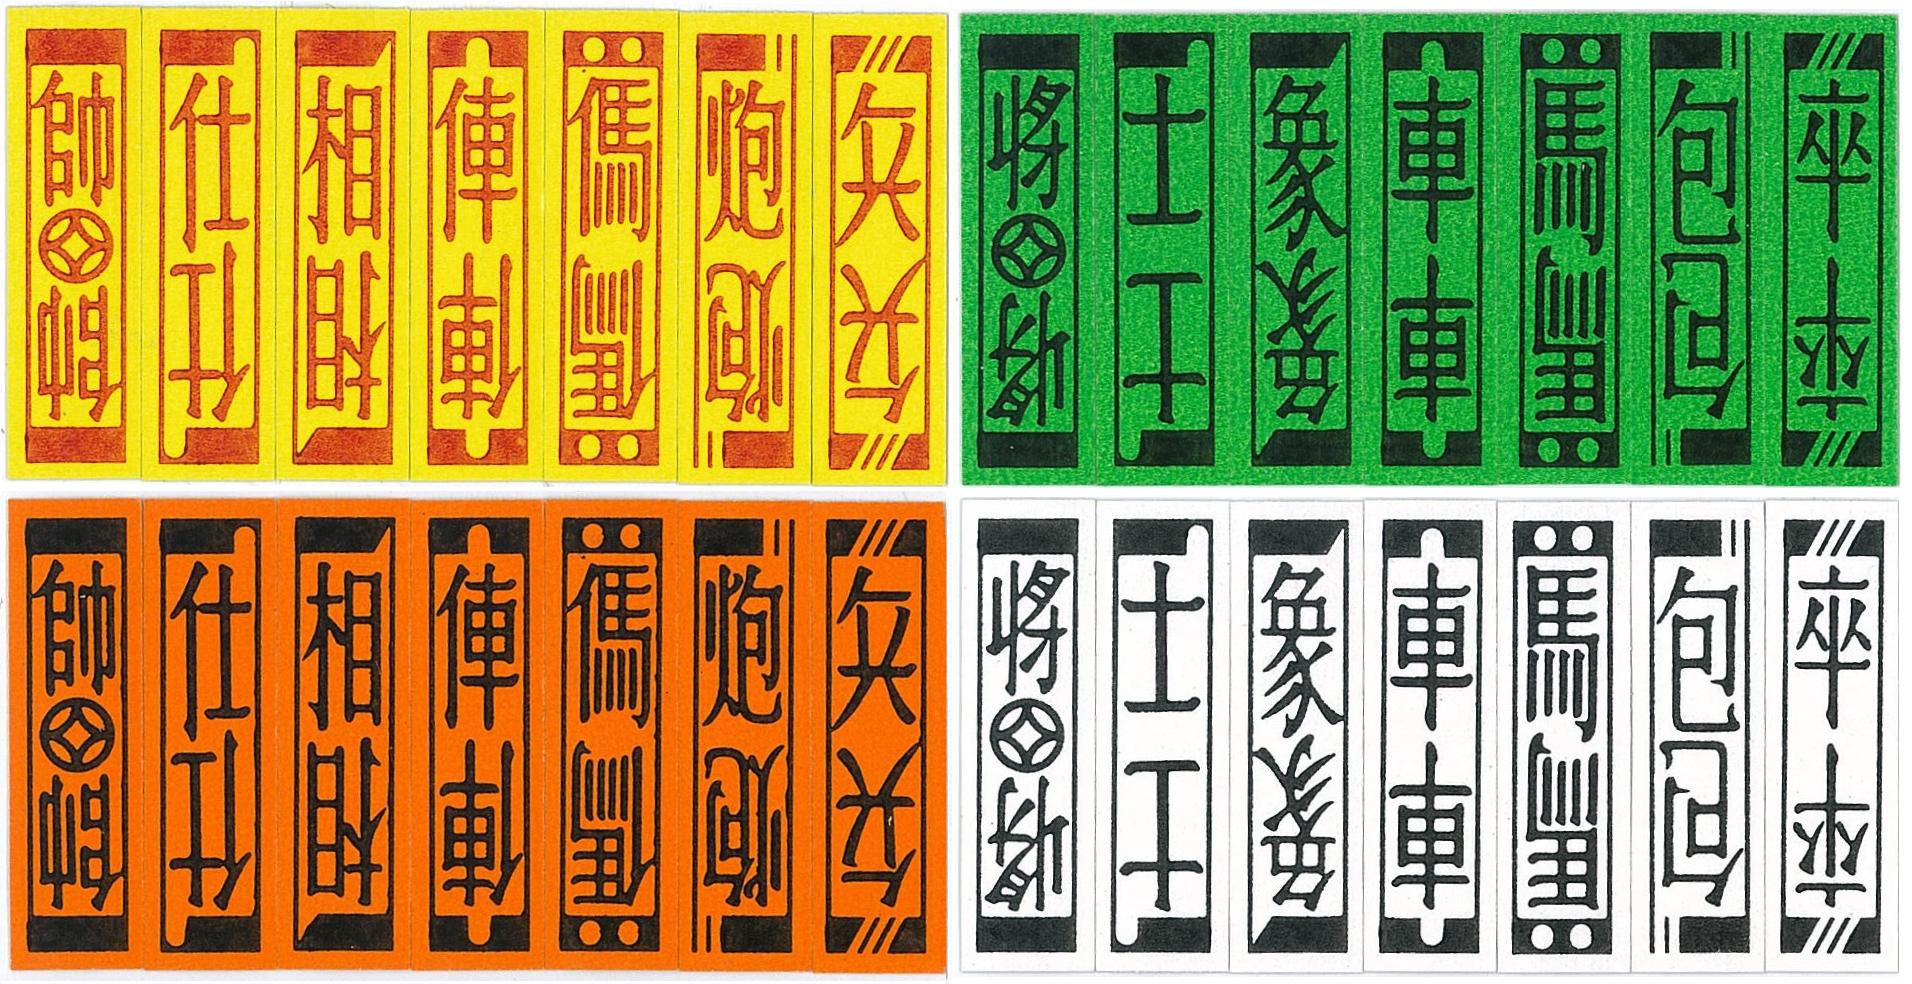 台灣的四色牌.png